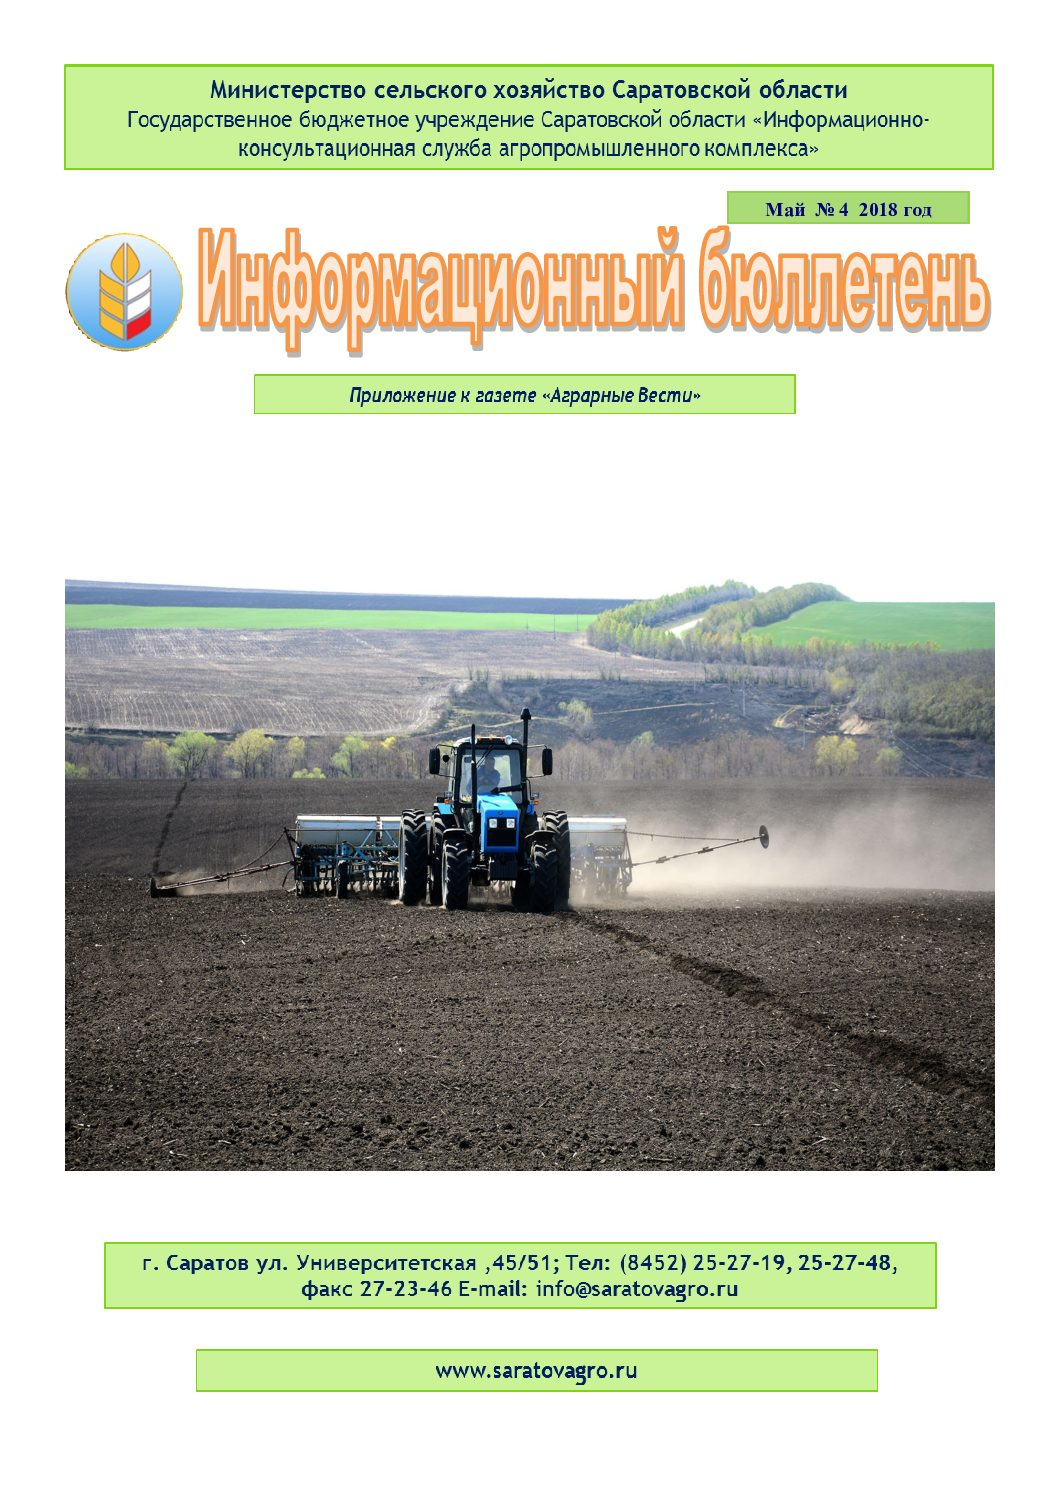 https://saratovagro.ru/wp-content/uploads/2020/08/4.2018-1-pdf.jpg